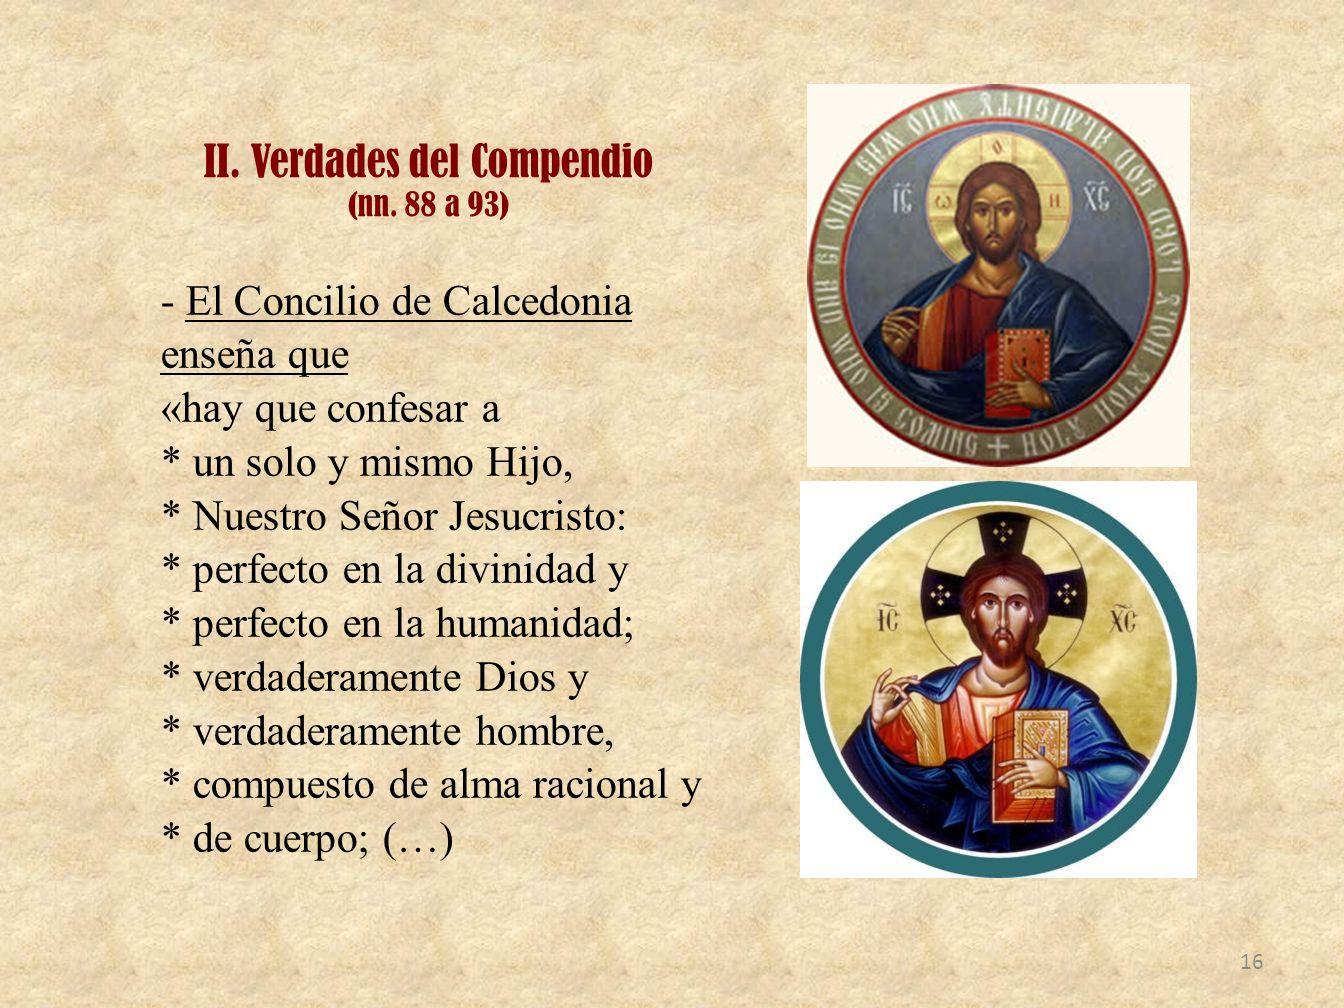 II. Verdades del Compendio (nn. 88 a 93)